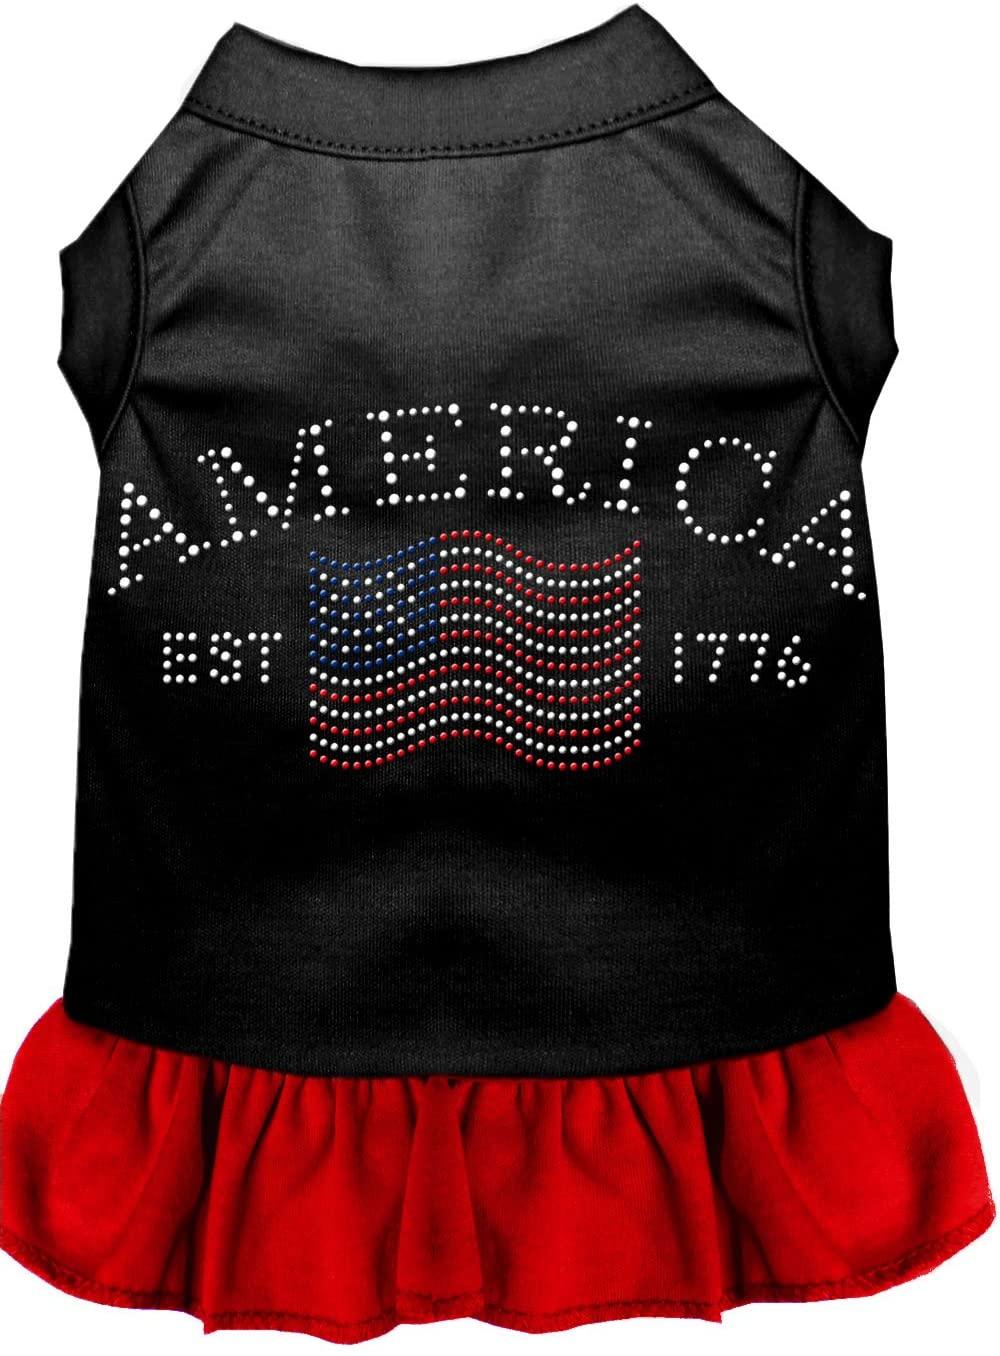 Mirage Classic American Rhinestone Dog Dress - Black with Red Skirt